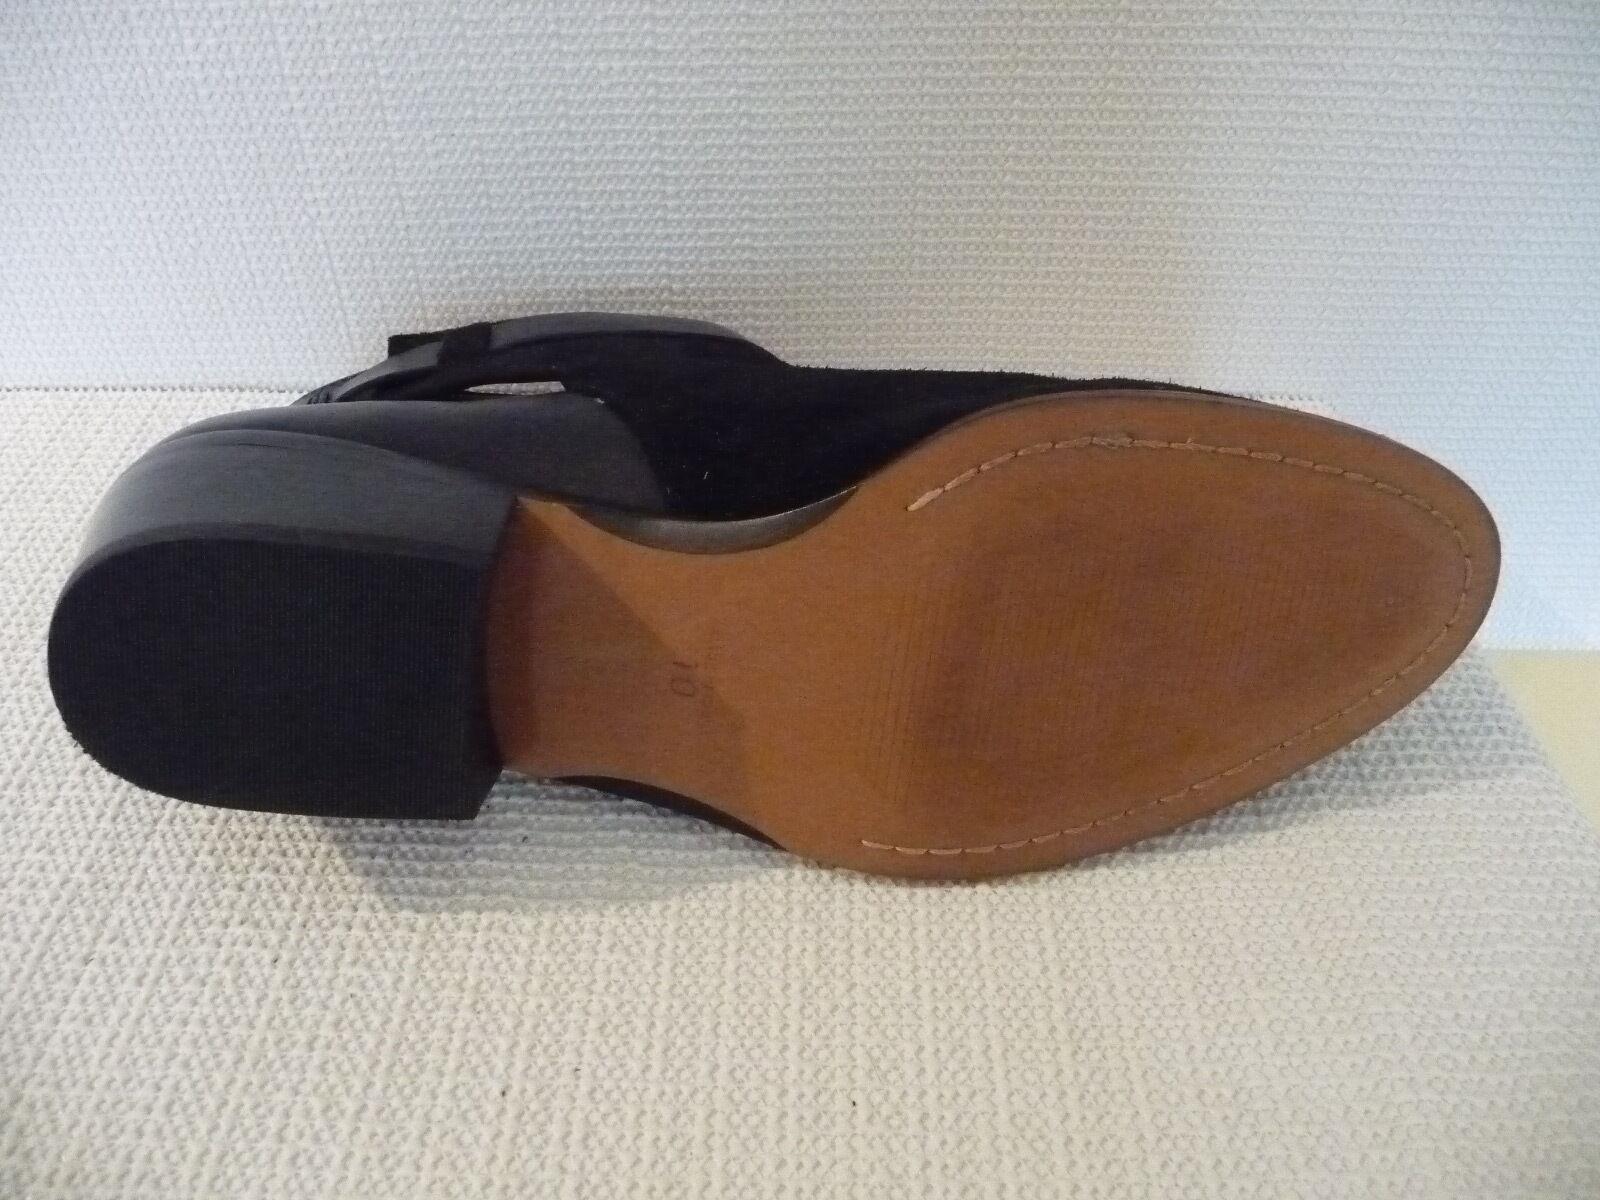 Nuevas botas Collar-Stud, madewell cherley Collar-Stud, botas B2975, Negro, Talla 10, 198   393c1c